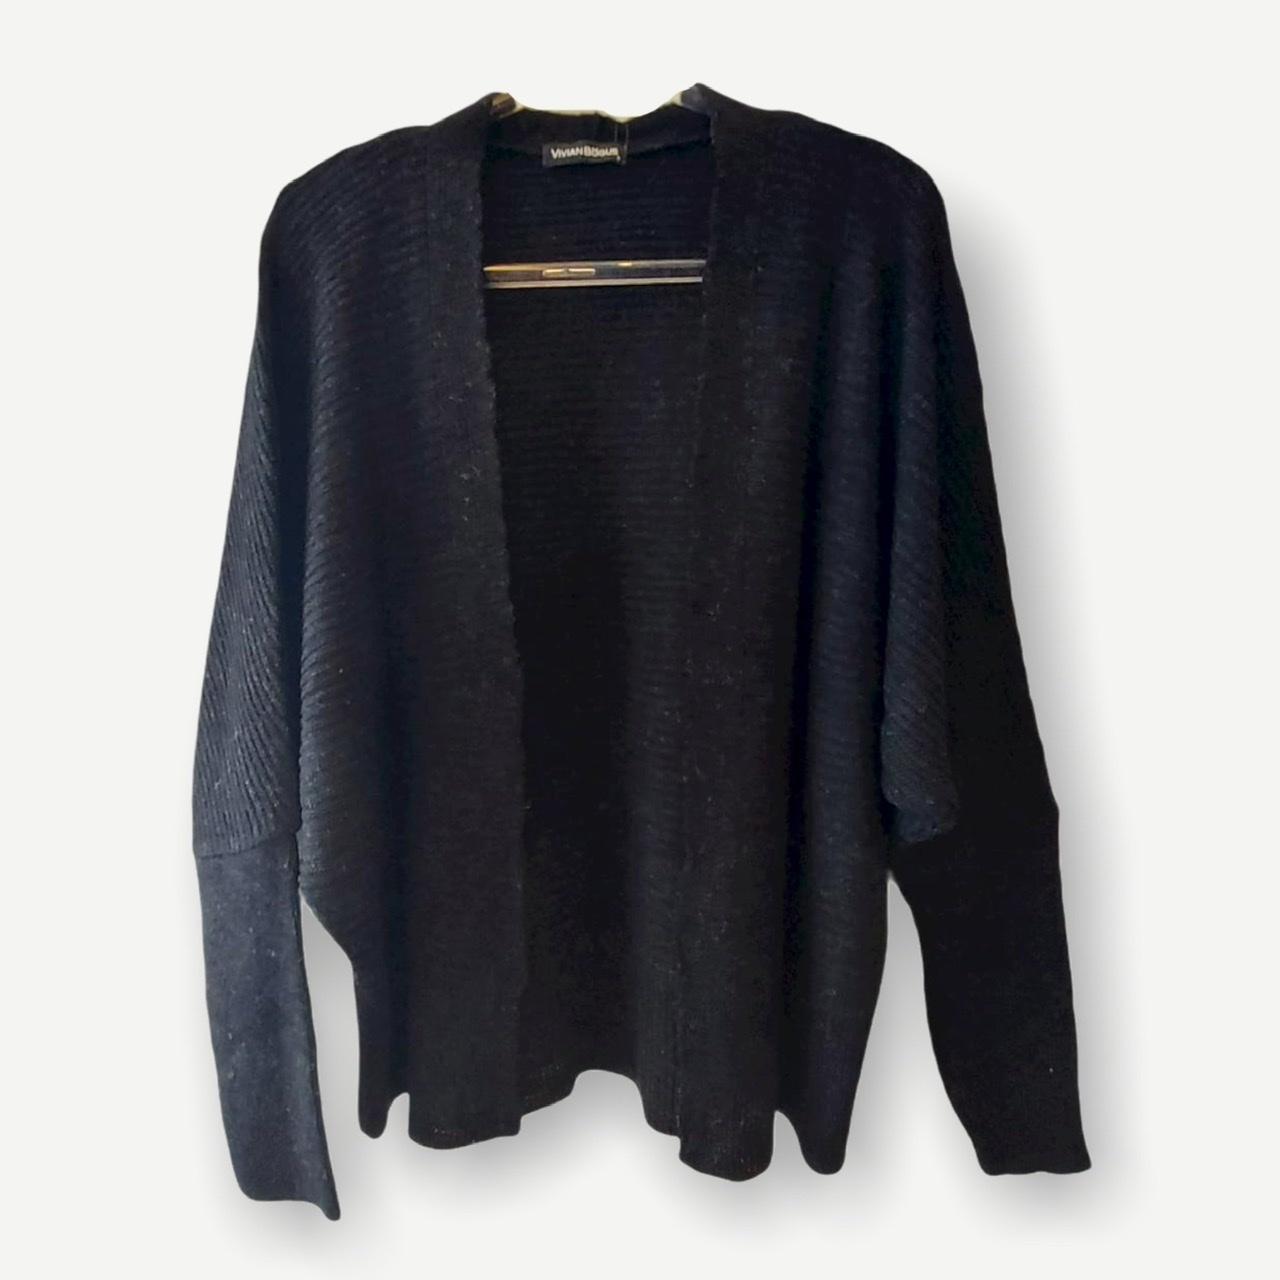 Casaco Vitória preto tricot   - Vivian Bógus